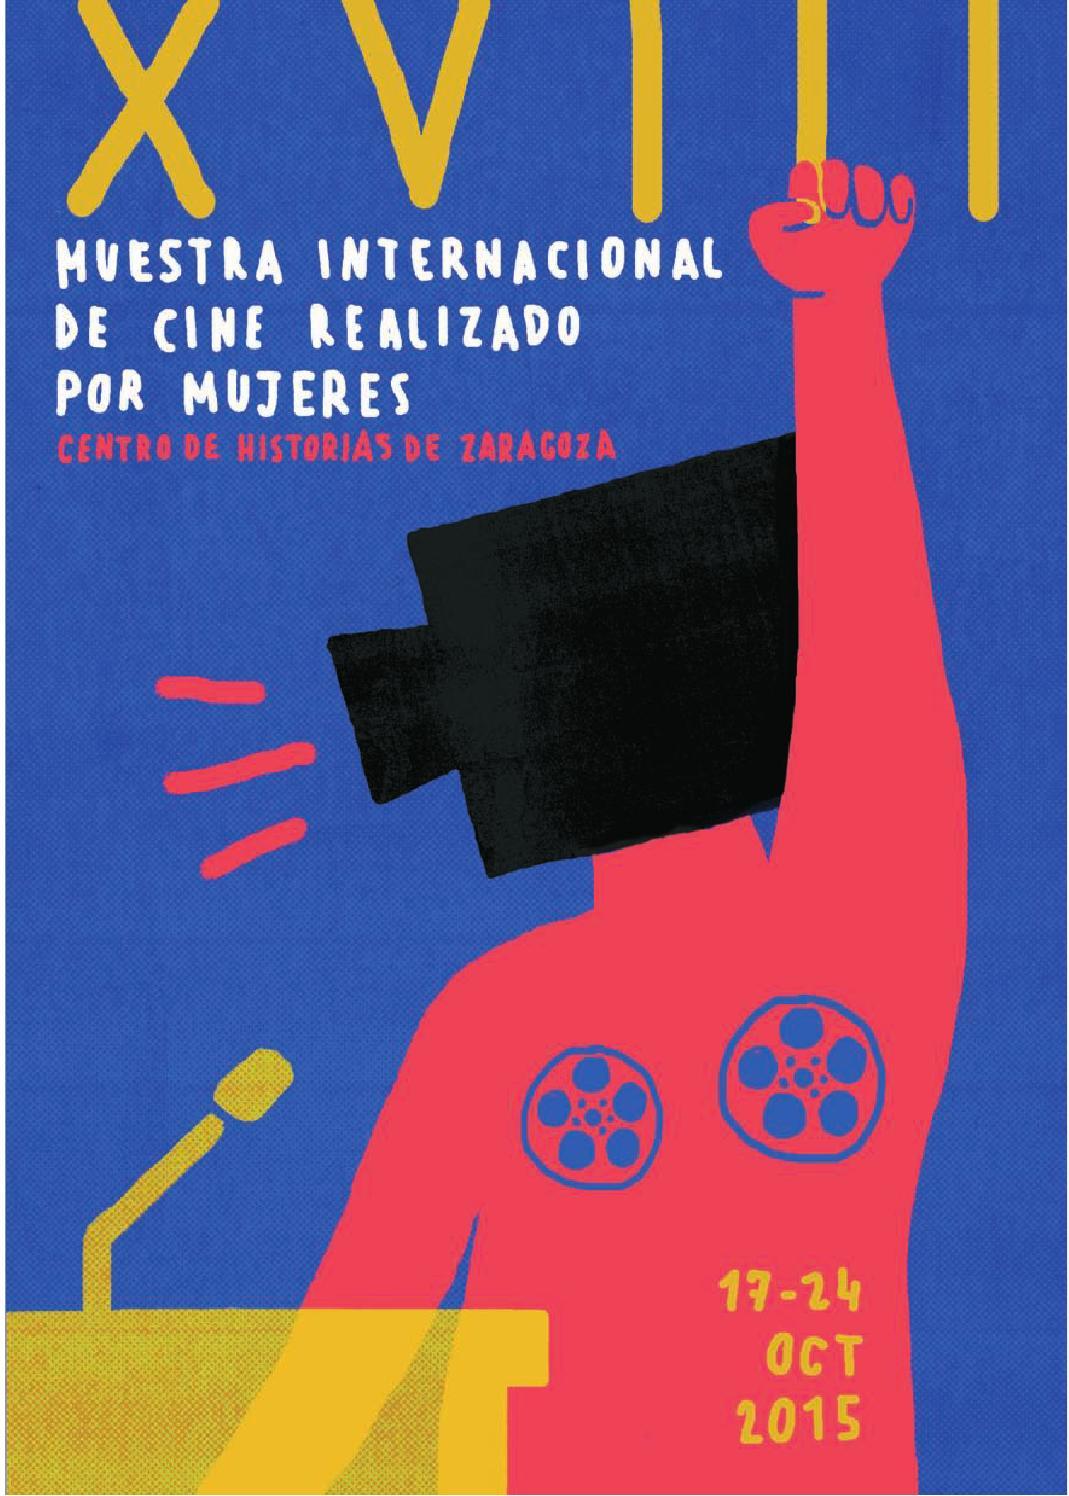 XVIII muestra programa2015 by Muestra Cine Mujeres Zaragoza - issuu